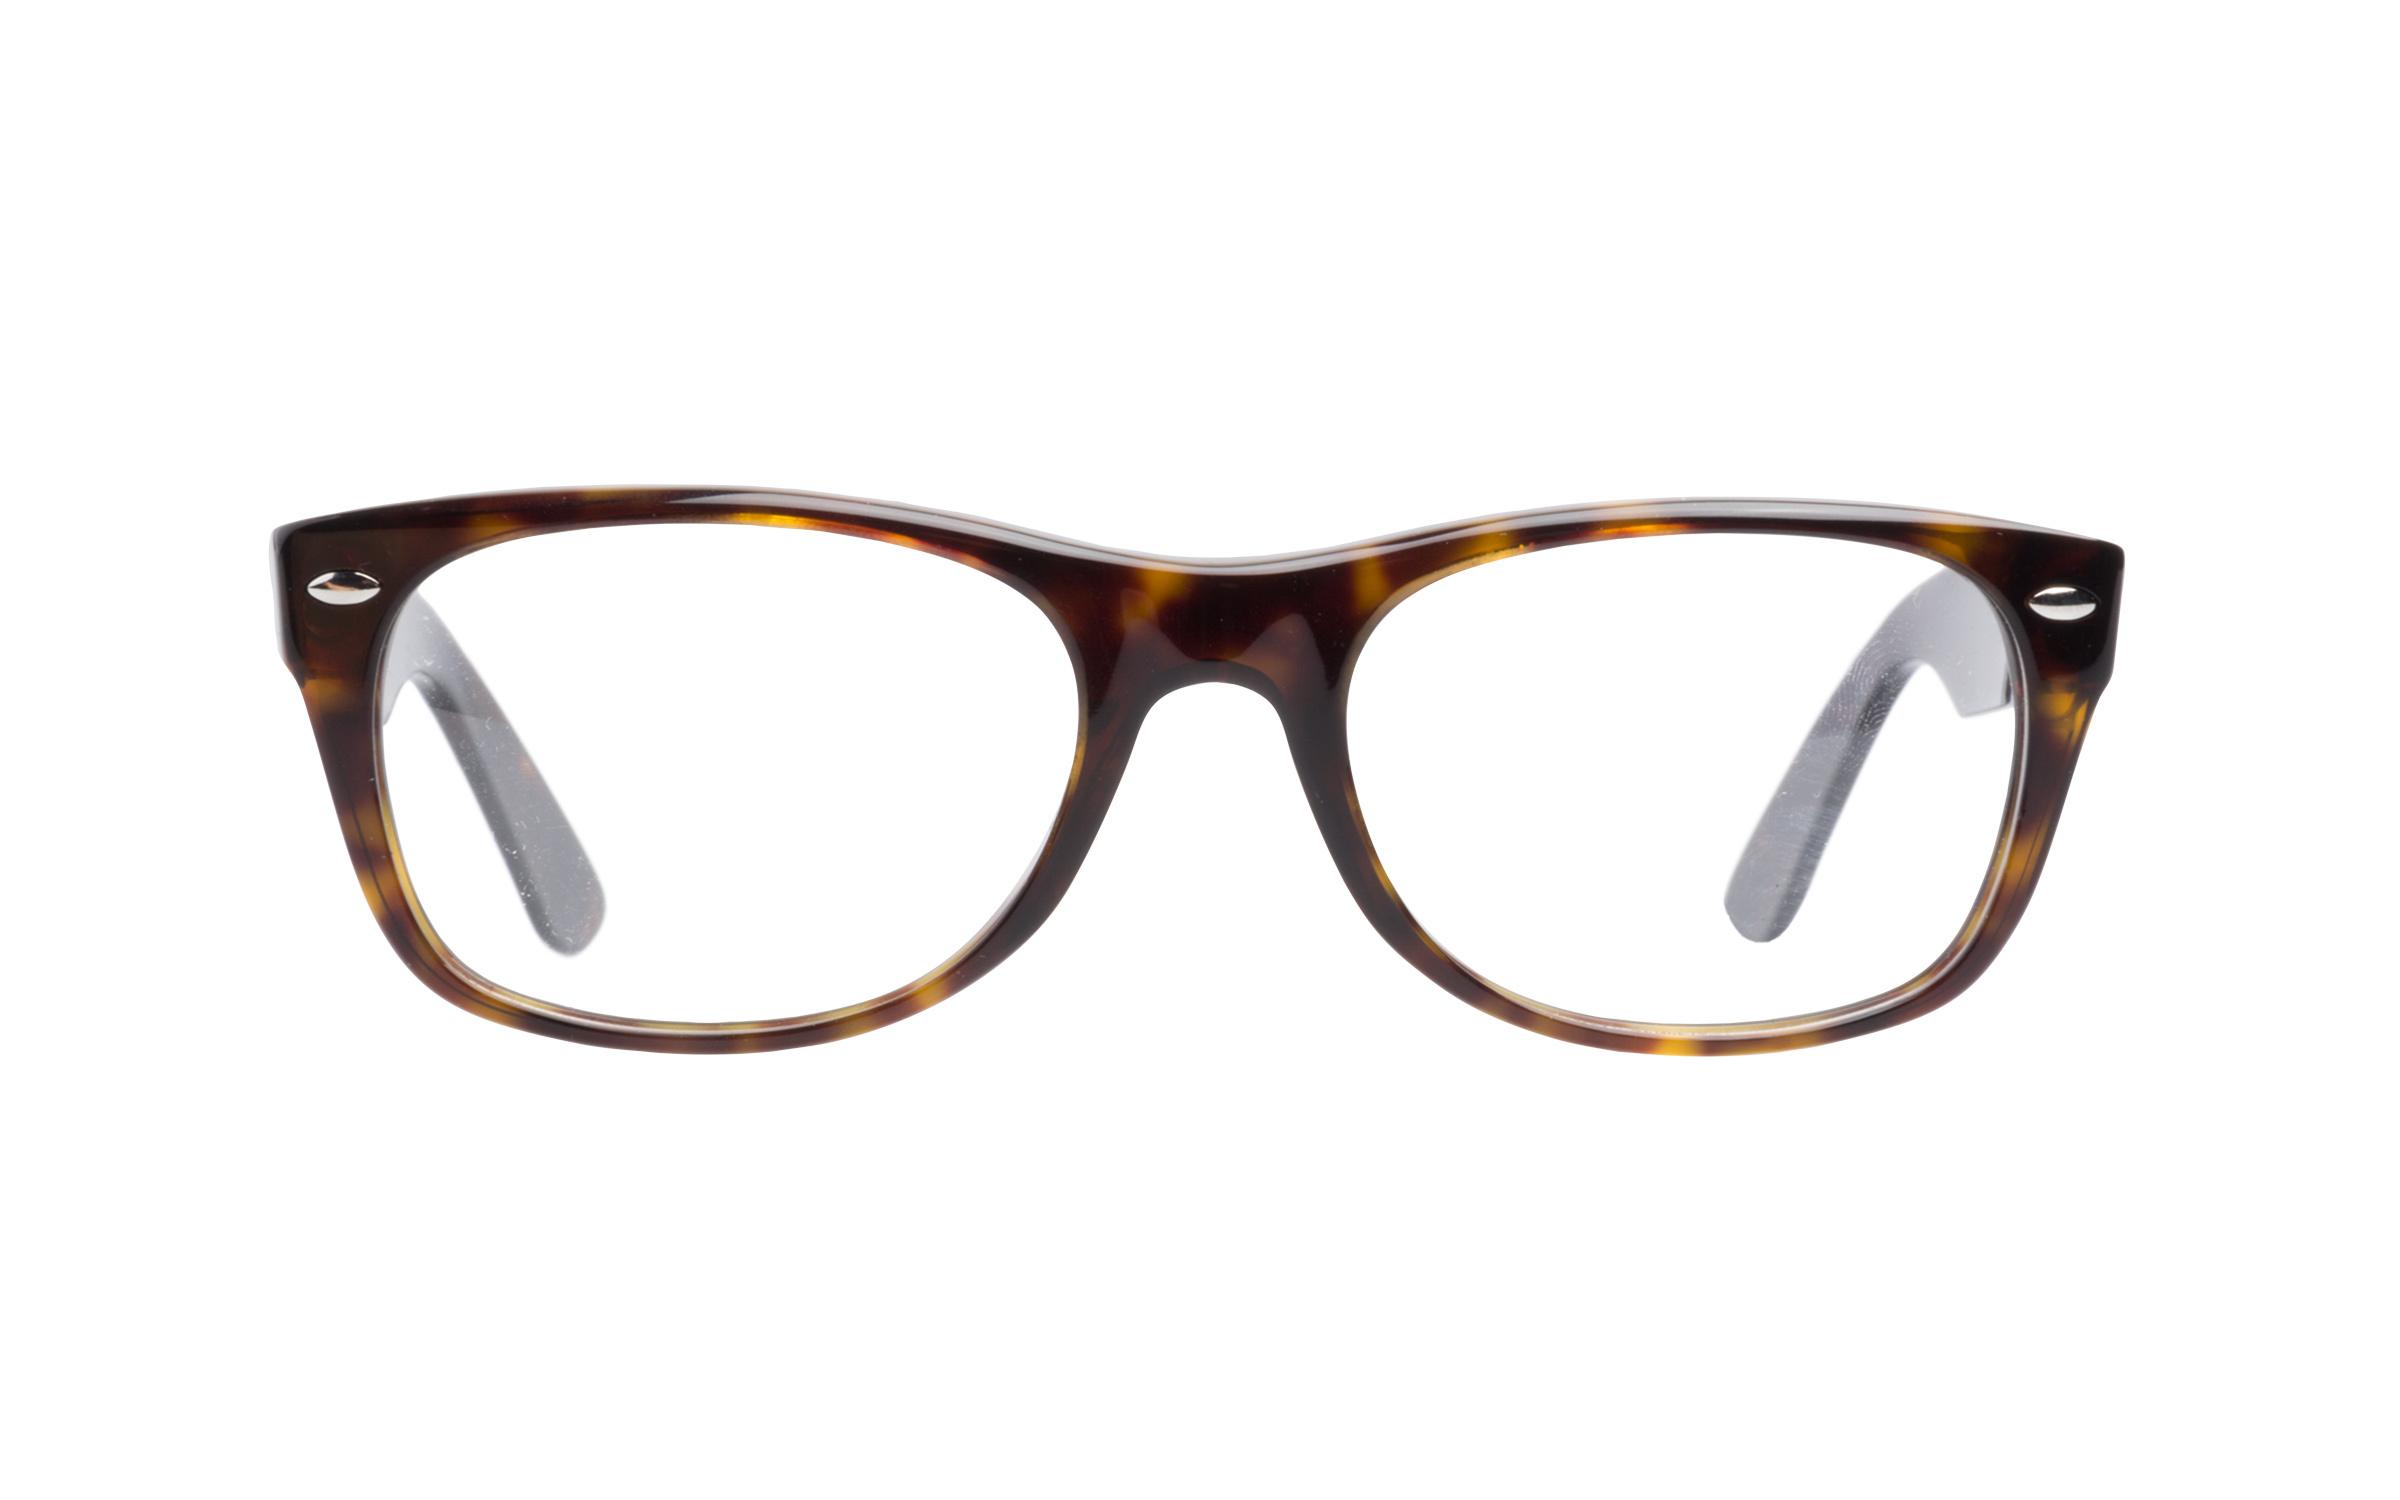 RayBan_Glasses_Classic_BrownTortoise_Acetate_Online_Coastal